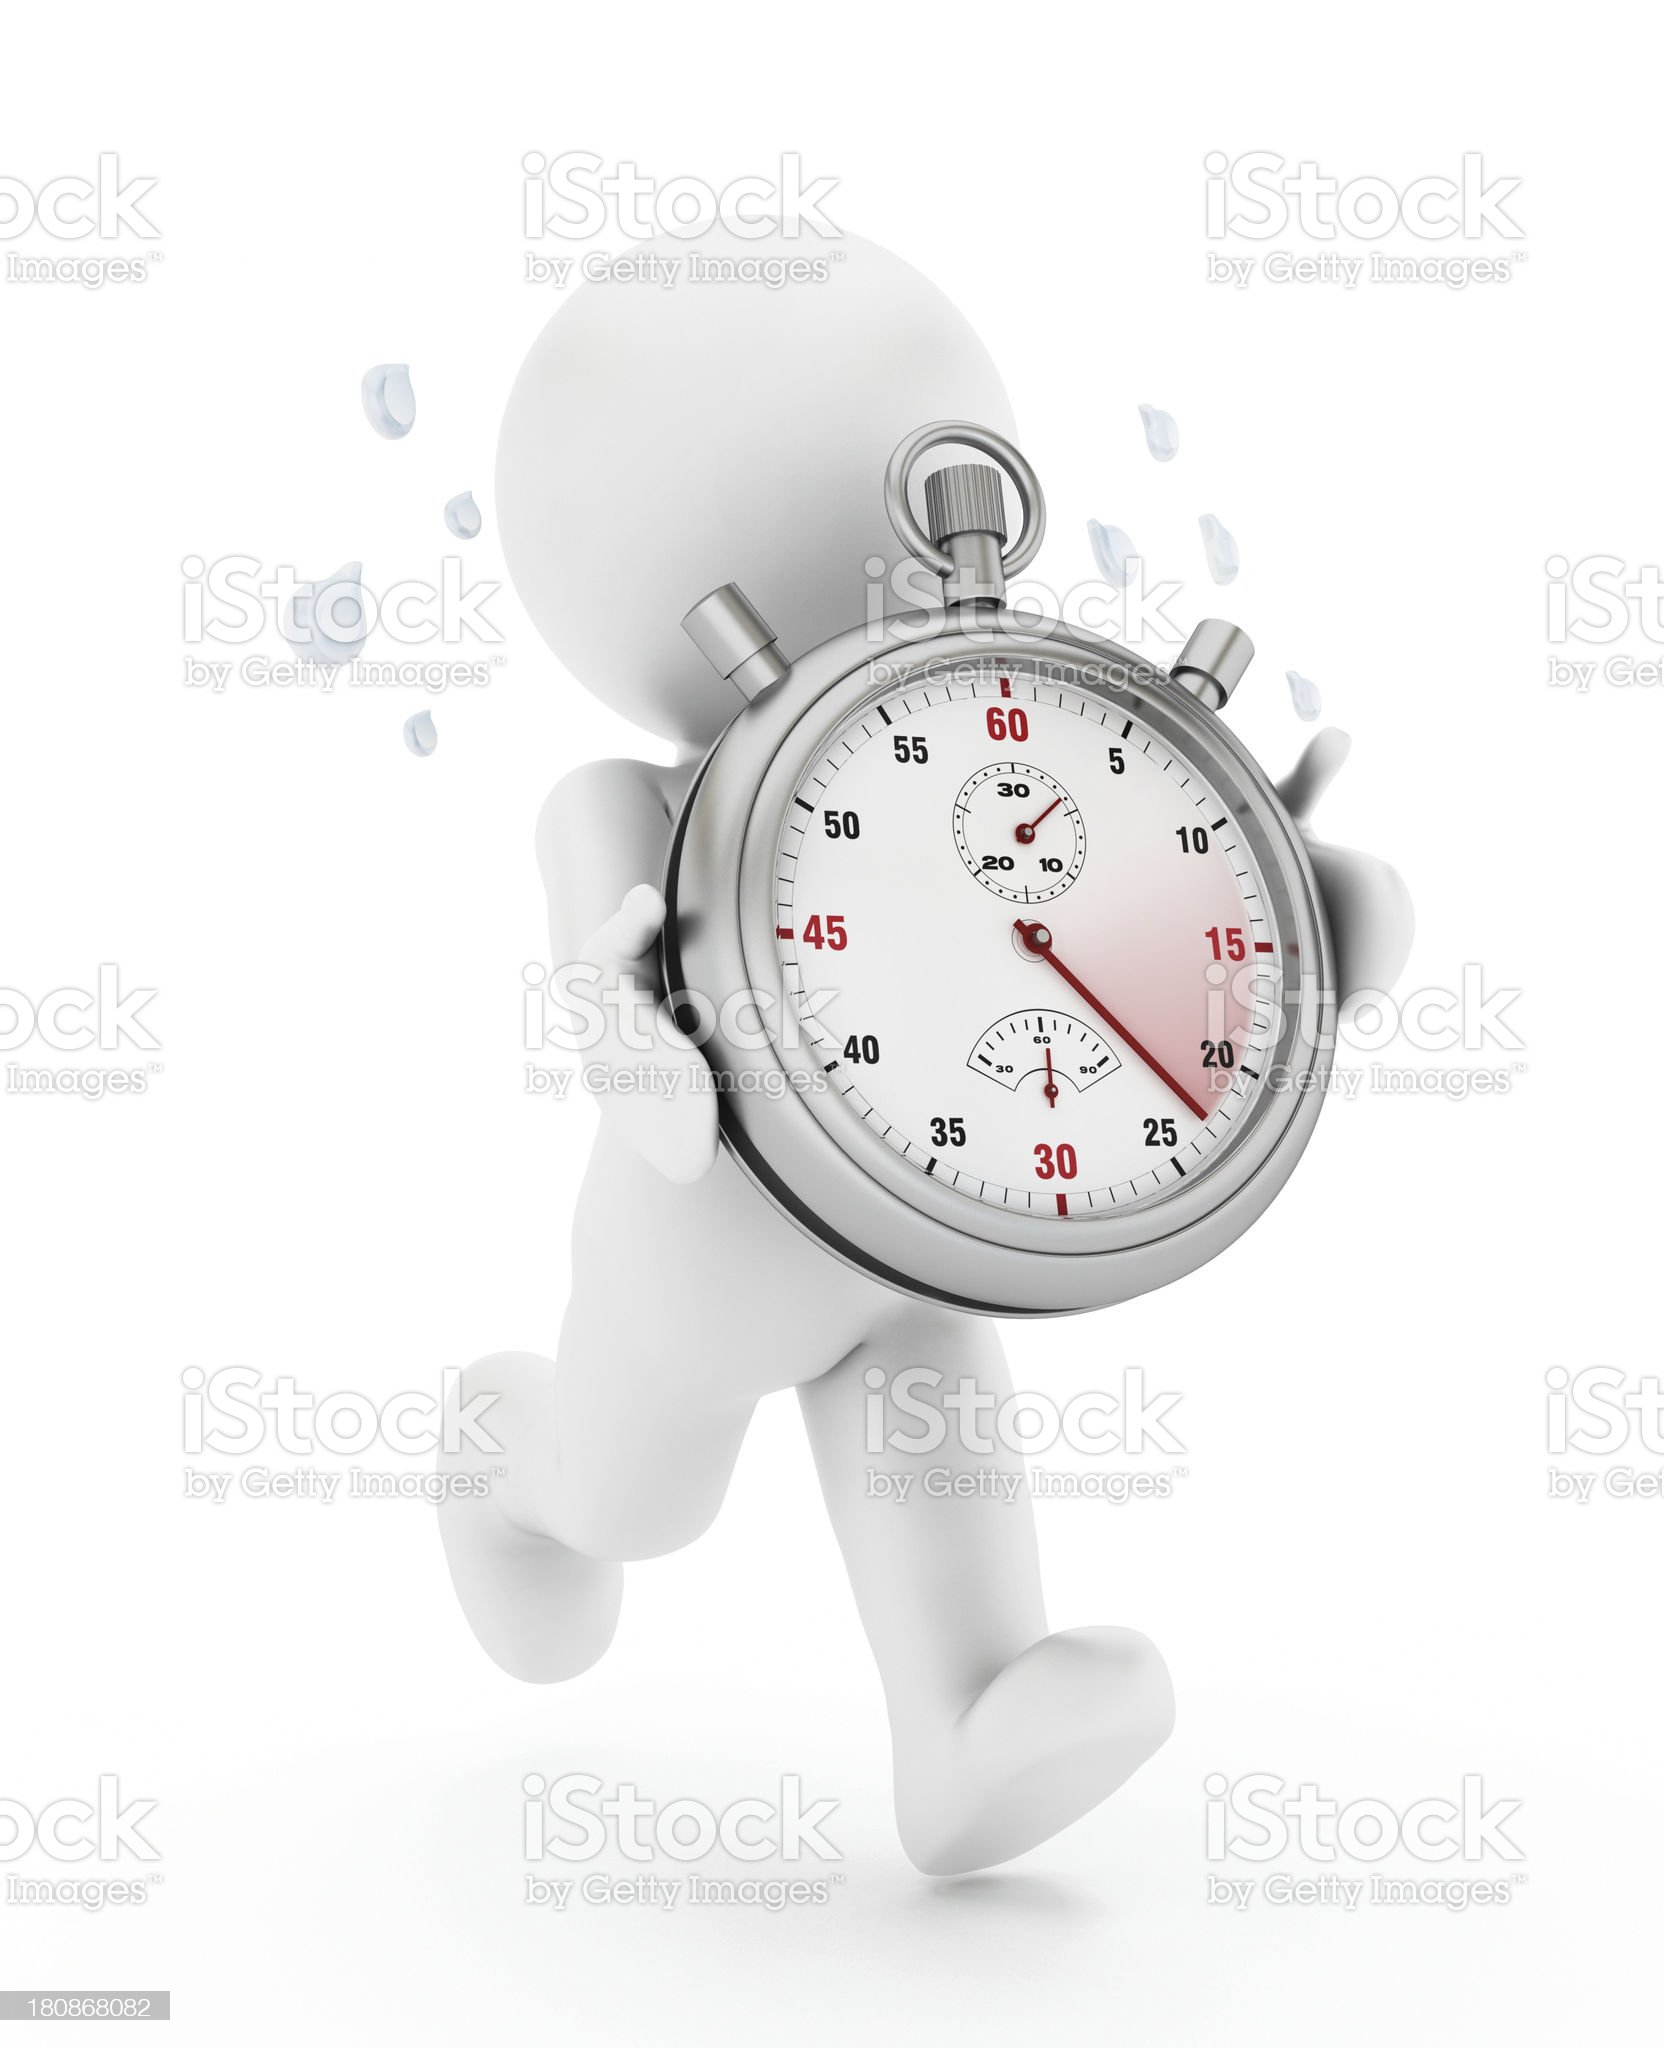 Man holding a chronometer royalty-free stock photo